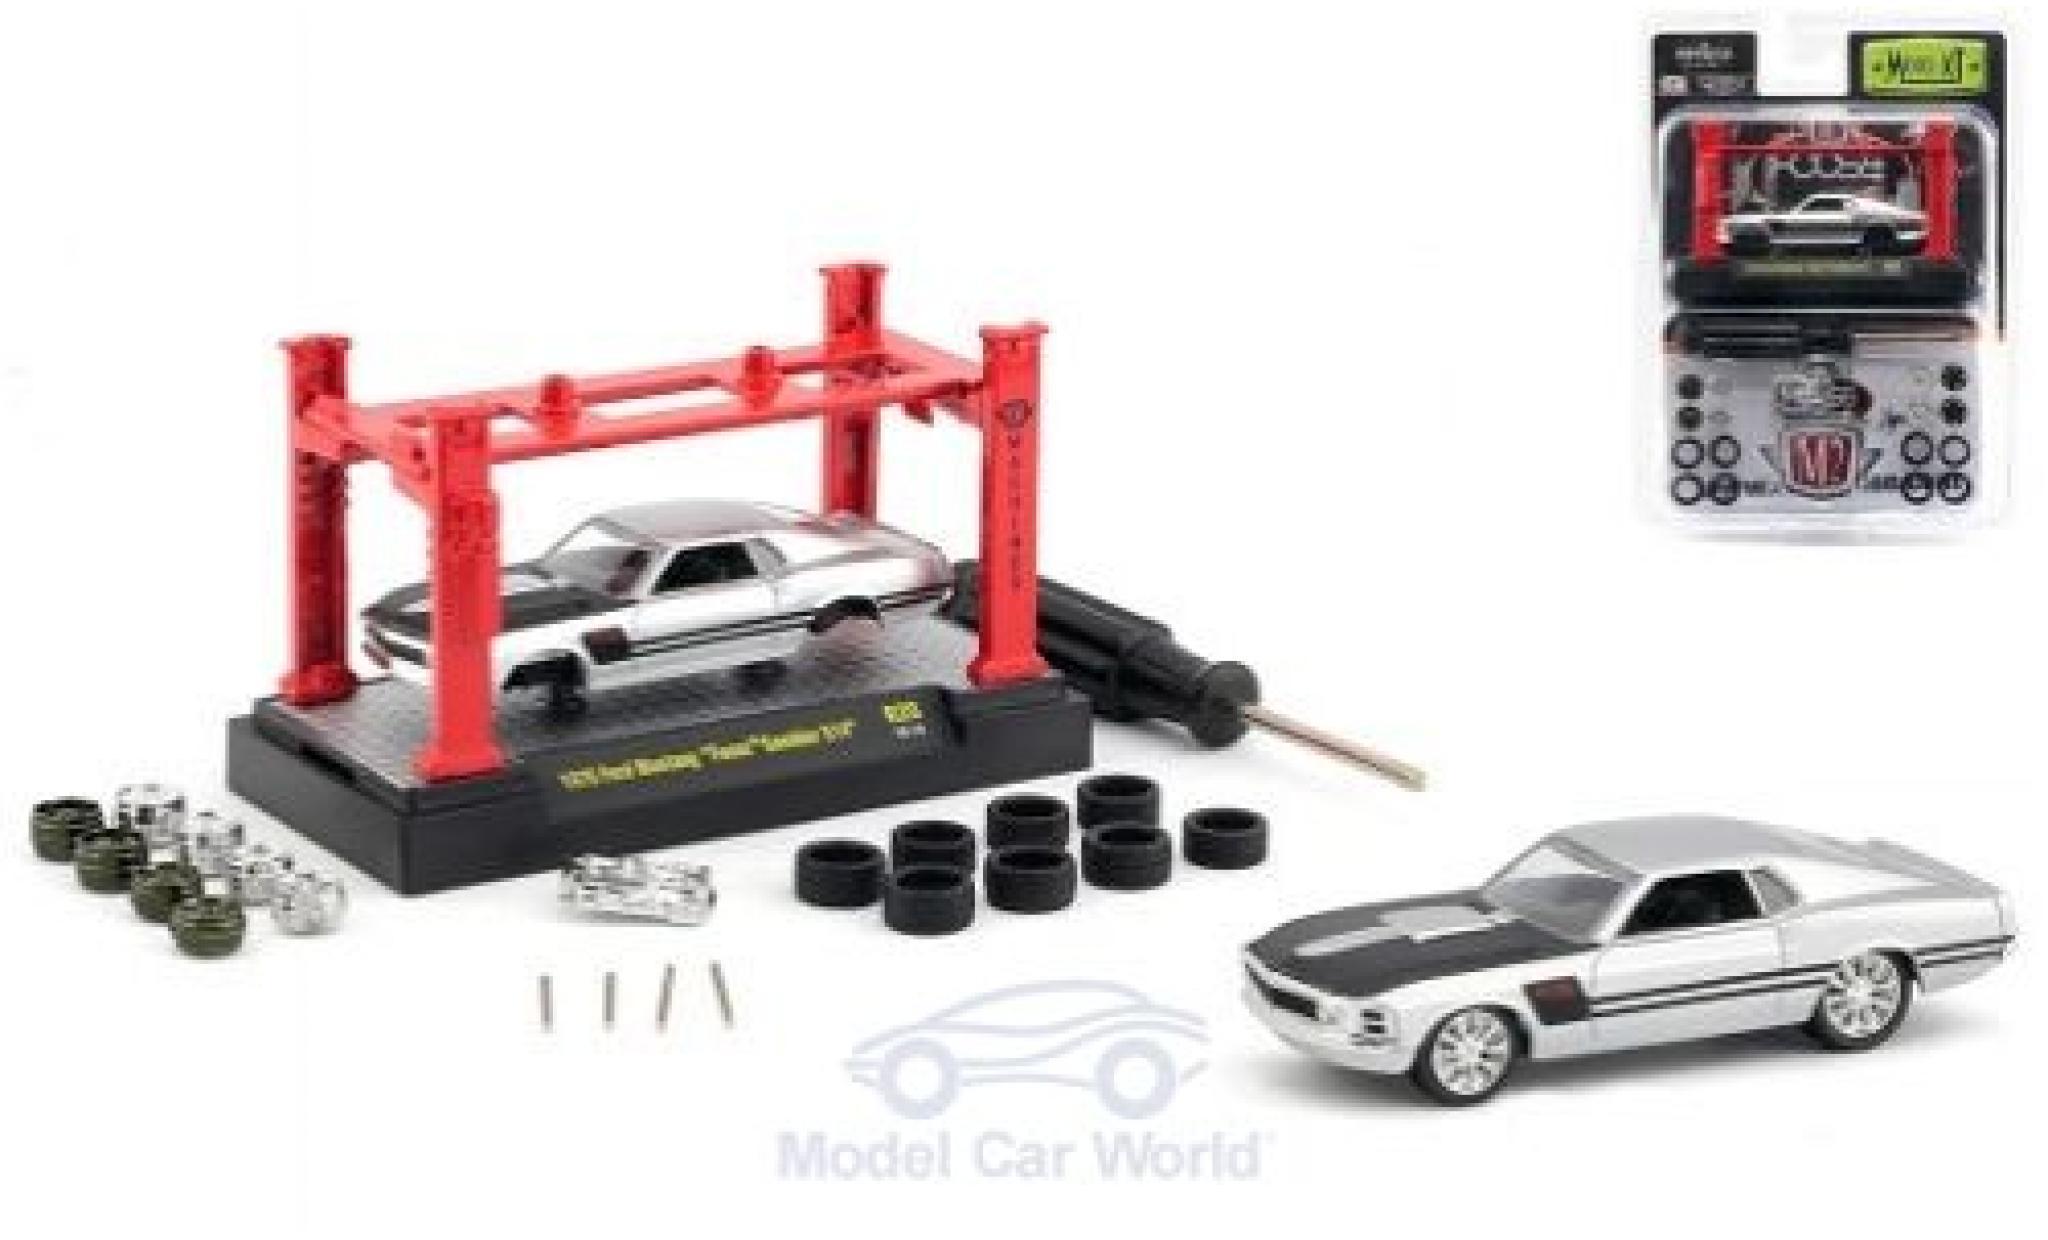 Ford Mustang 1970 1/64 M2 Machines grey/black Foose Gamble 514 1970 Model-Kit Bausatz inklusive 4 Ersatzrädern